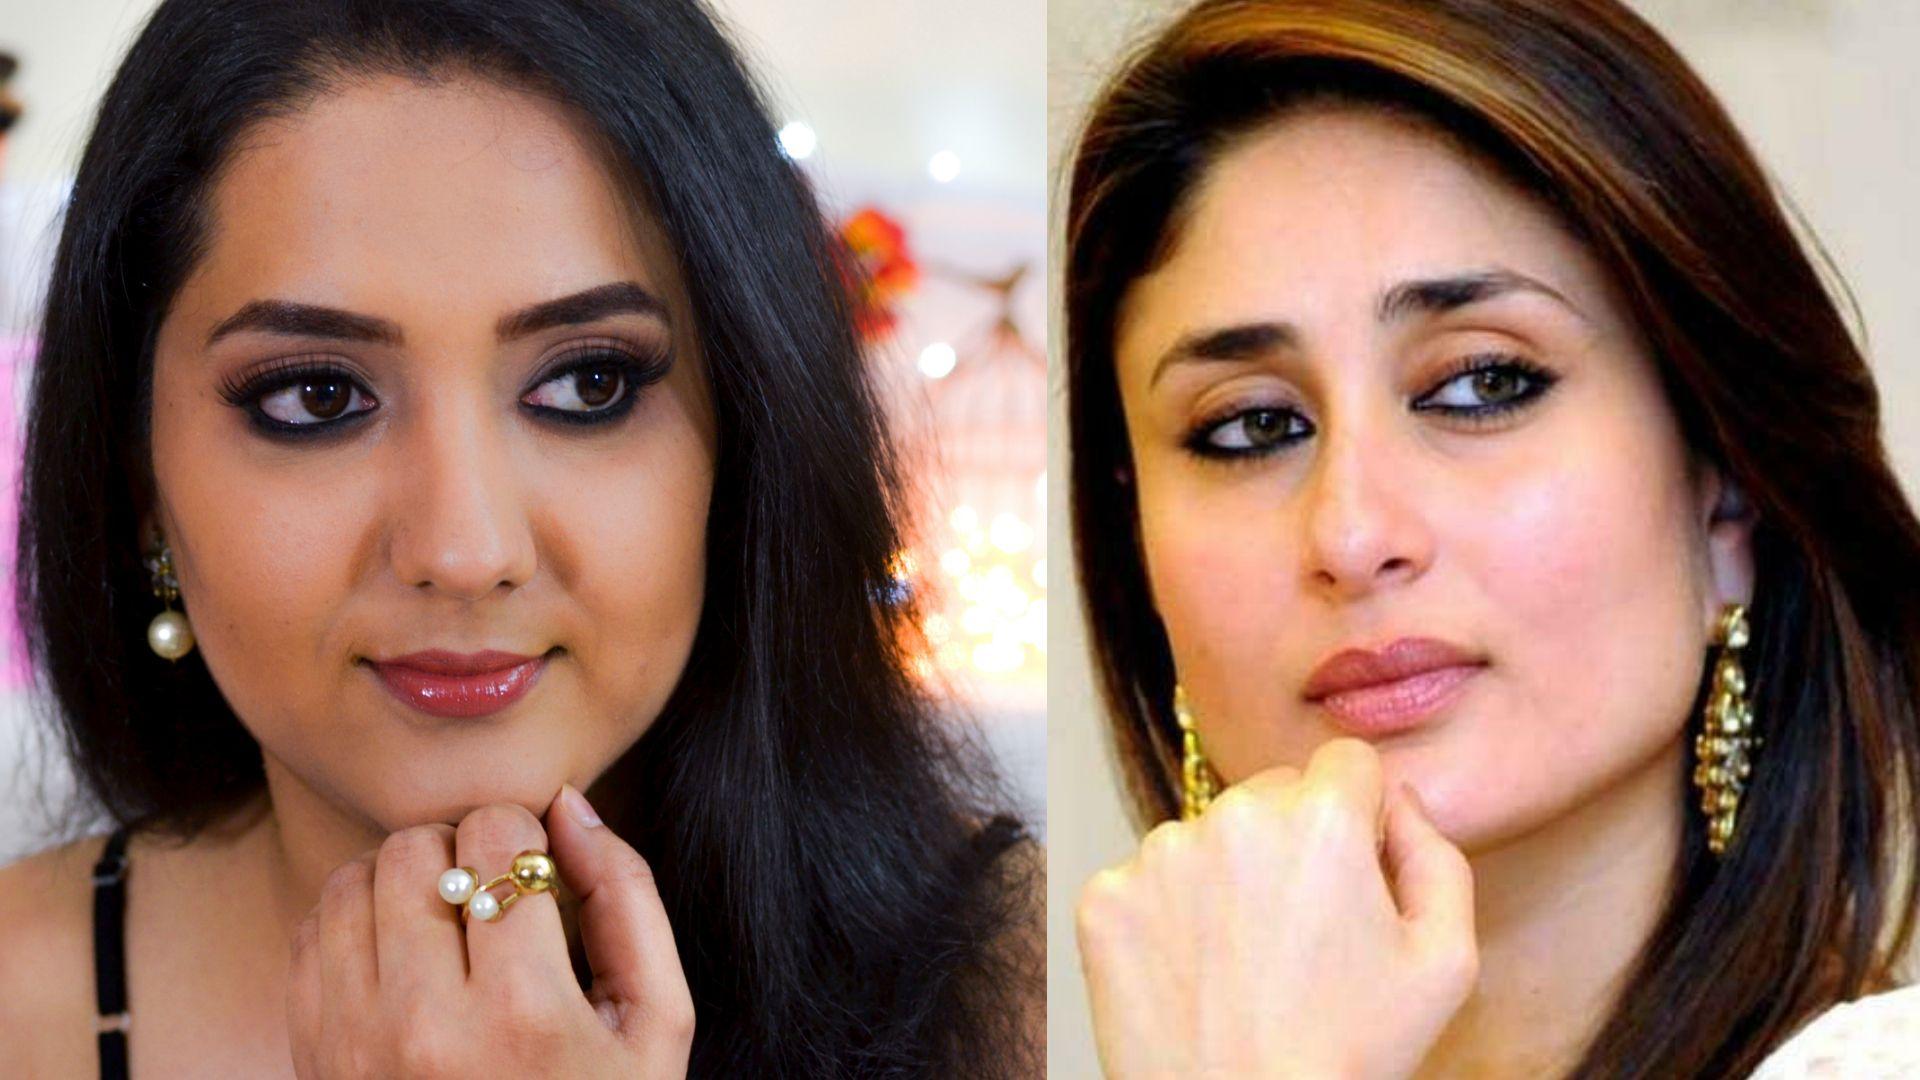 How To Apply Kajal Like Kareena Kapoor Khan Simple And Easy Way To Apply Kajal Like A Pro Kareena Kapoor Inspi Makeup Hacks Tutorials Eye Makeup How To Apply